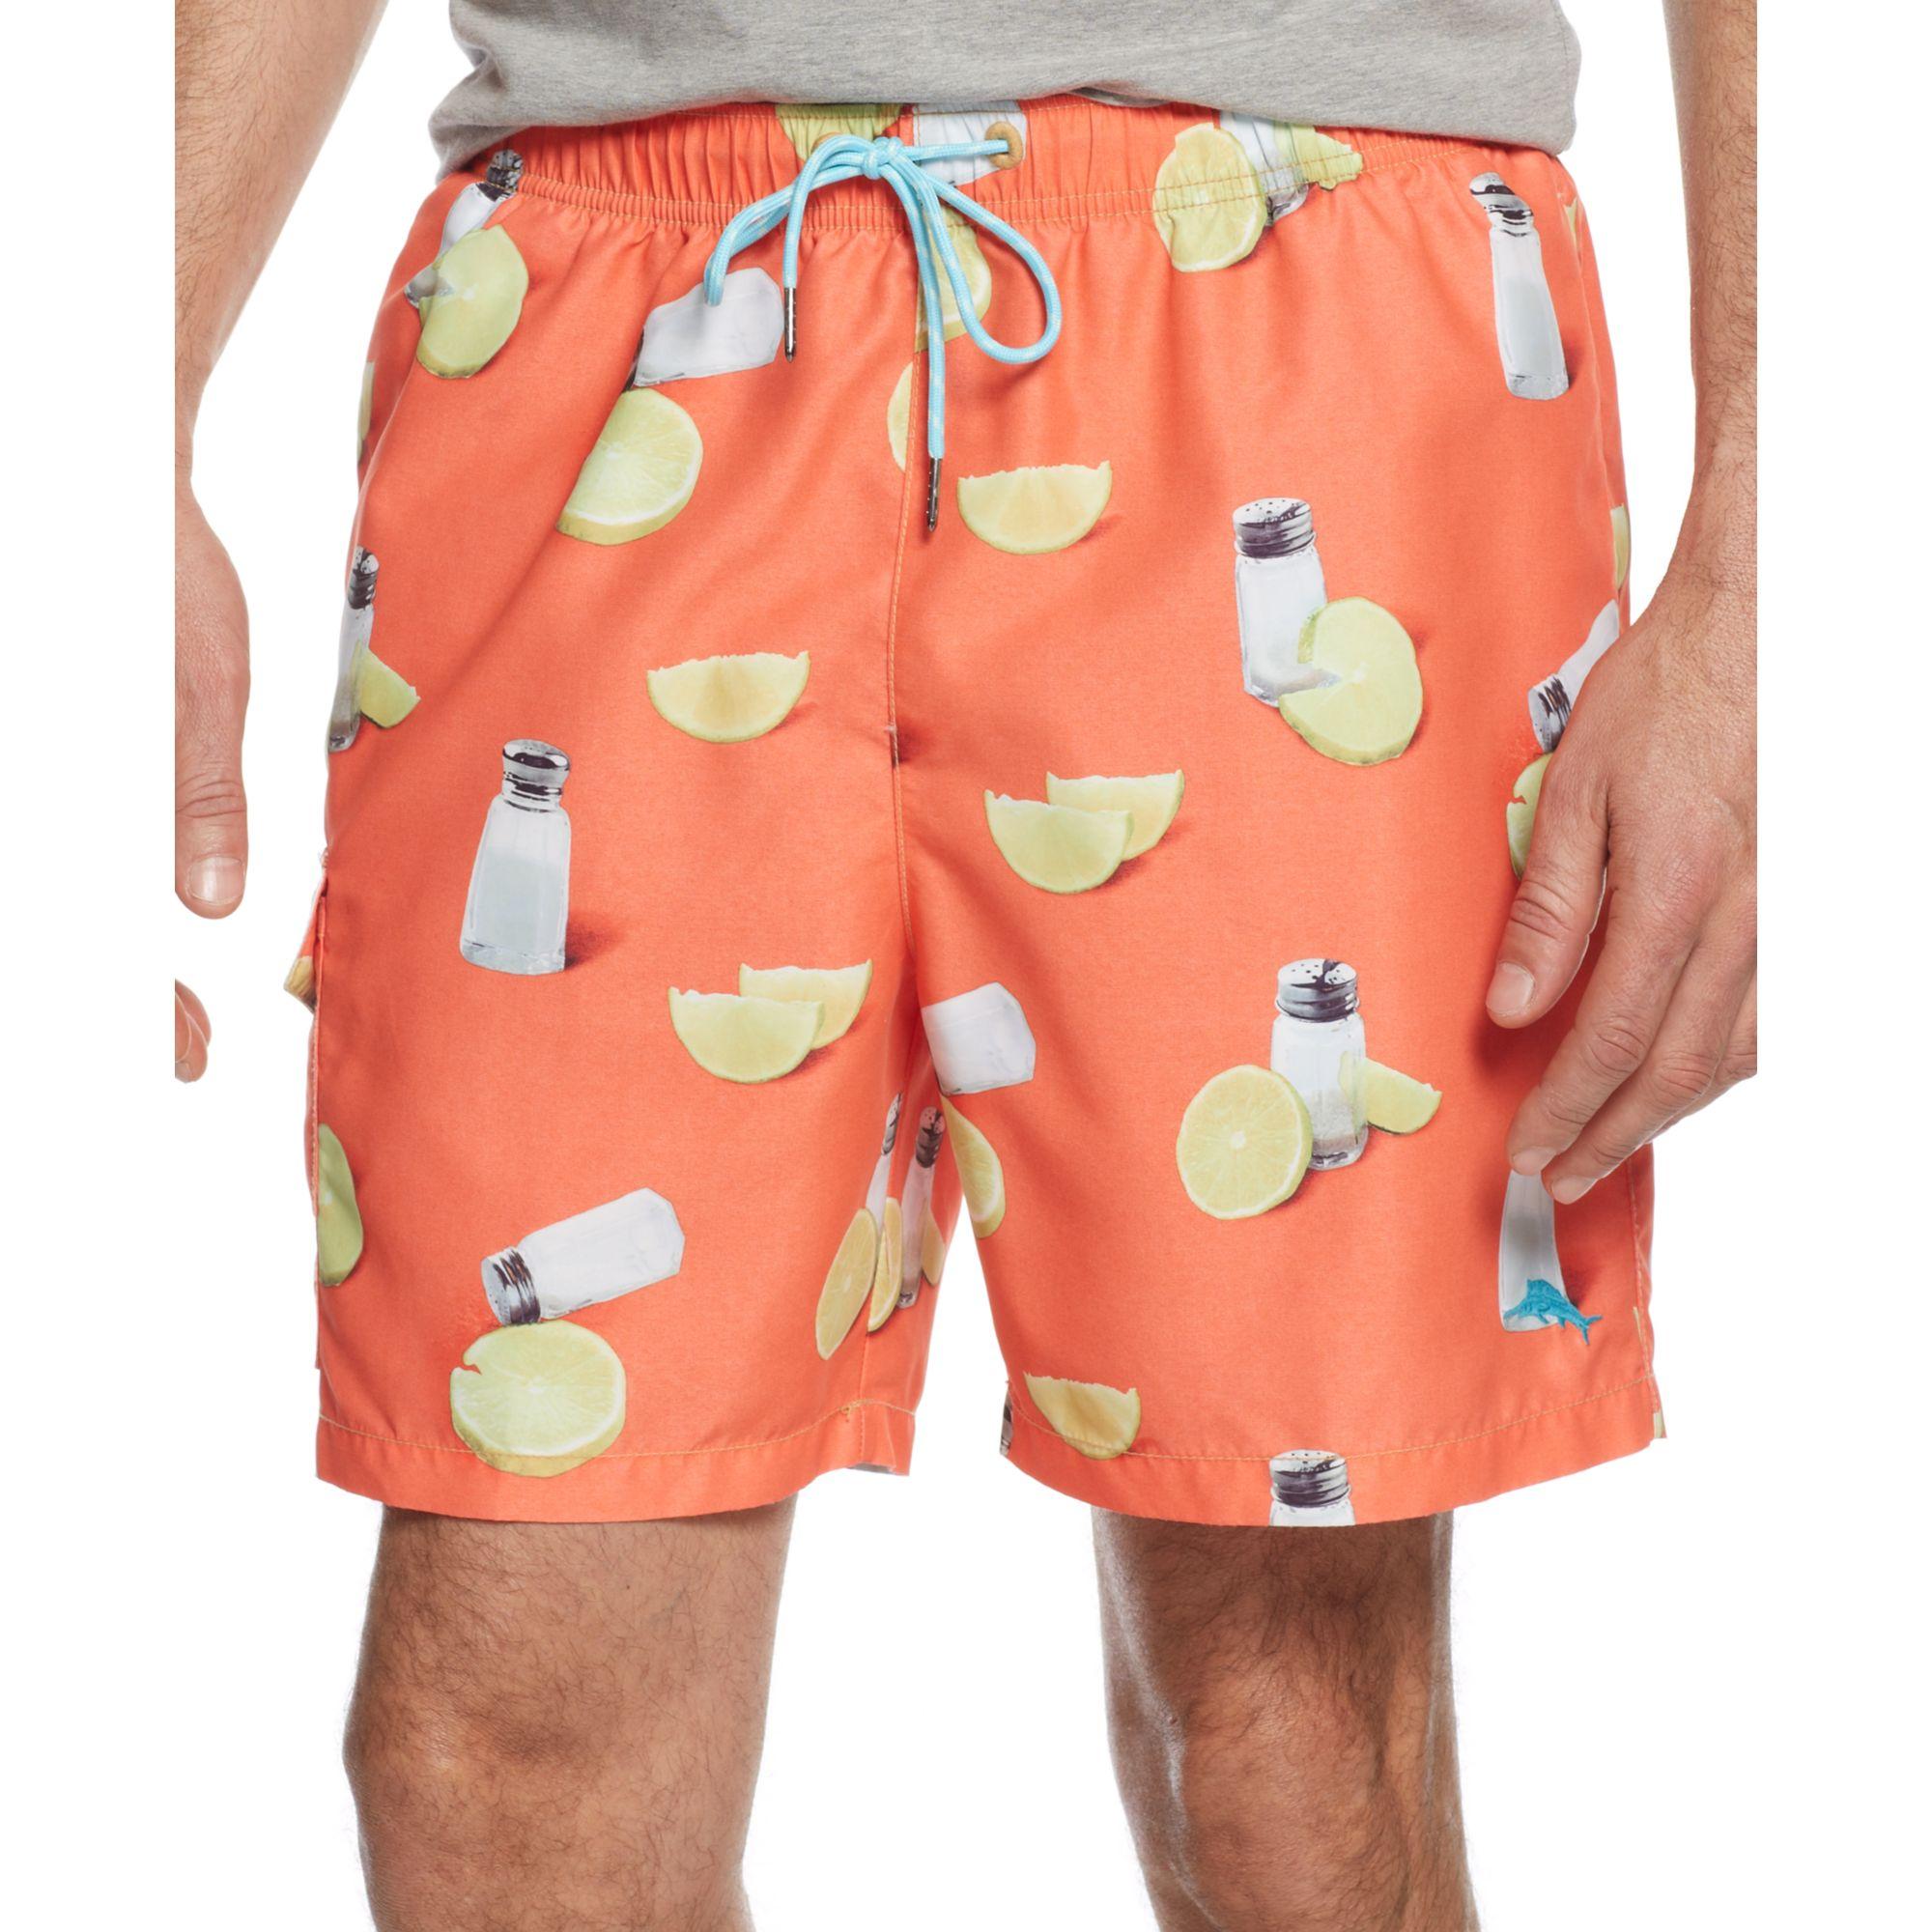 Tommy Bahama Naples Salt And Lime Swim Trunks In Orange